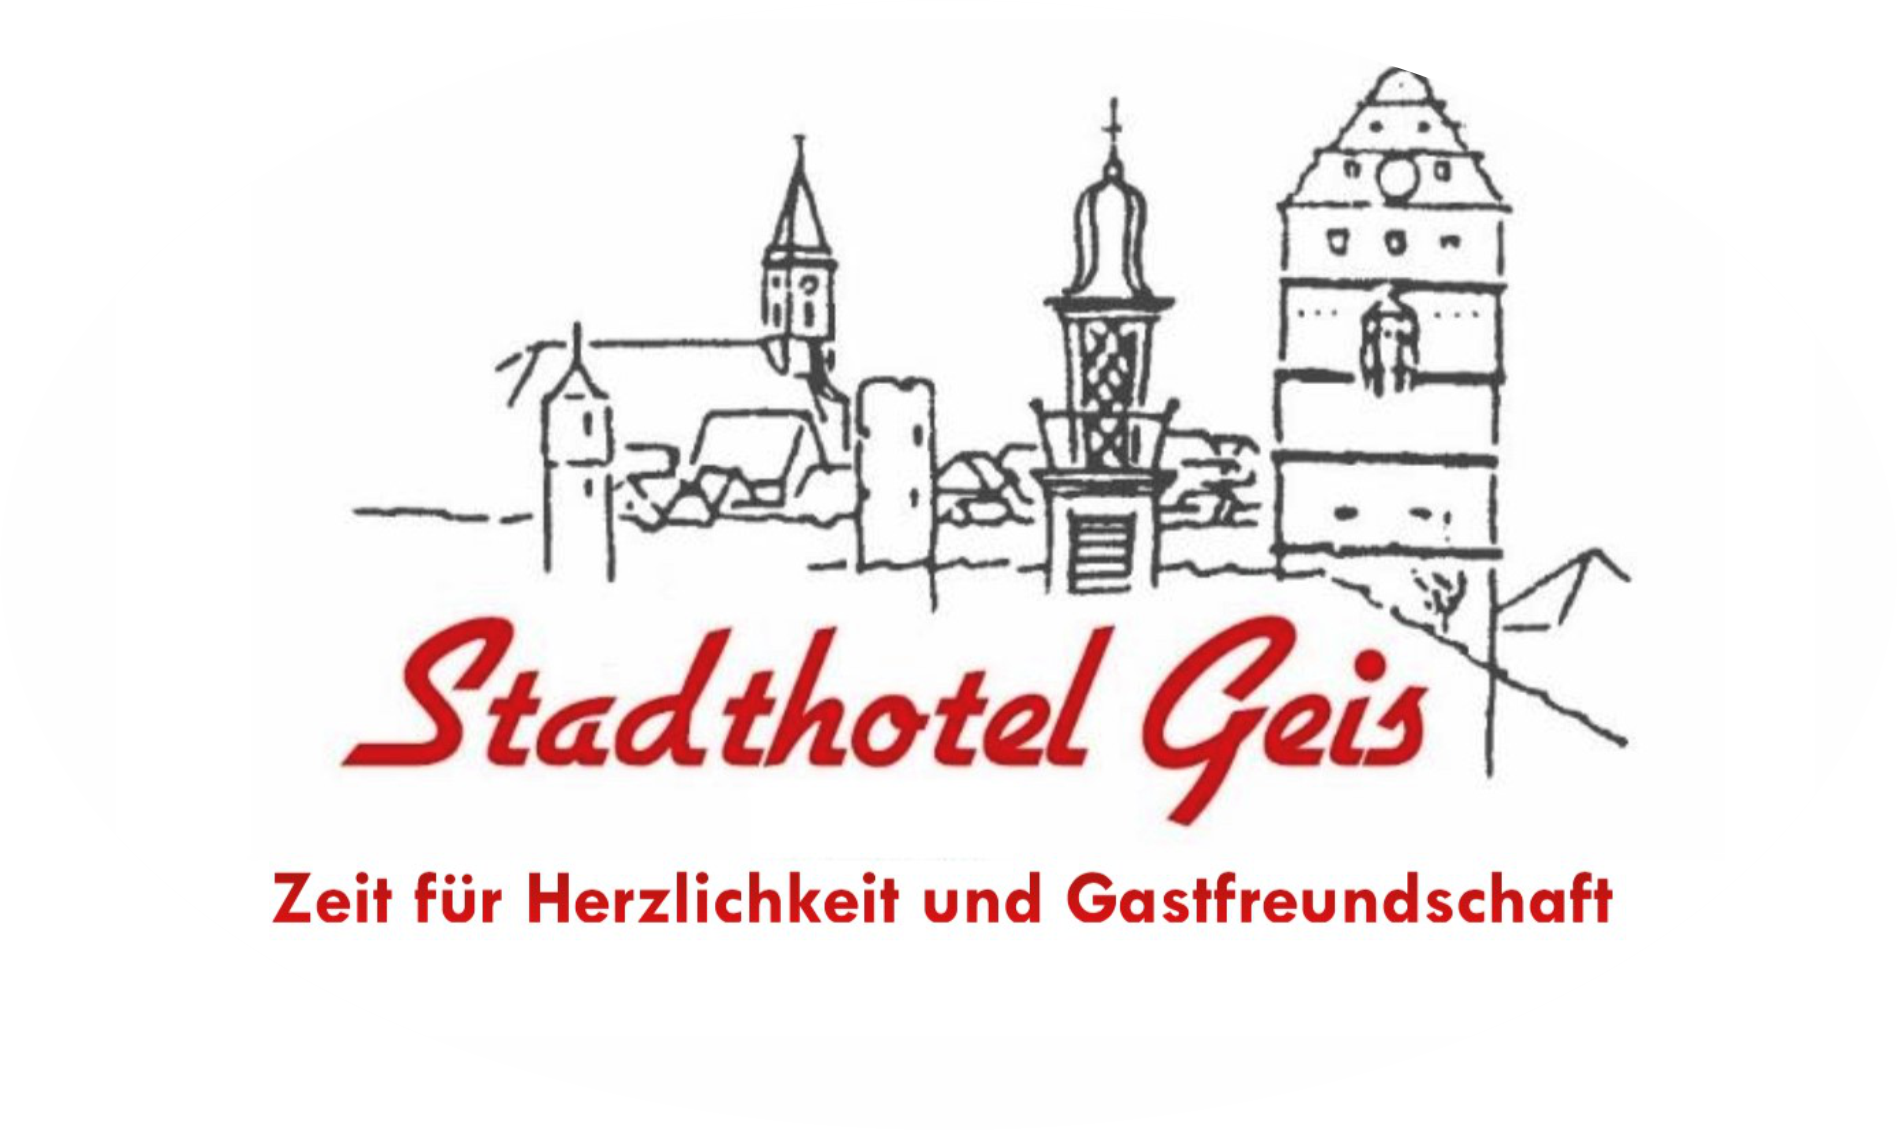 Stadthotel Geis